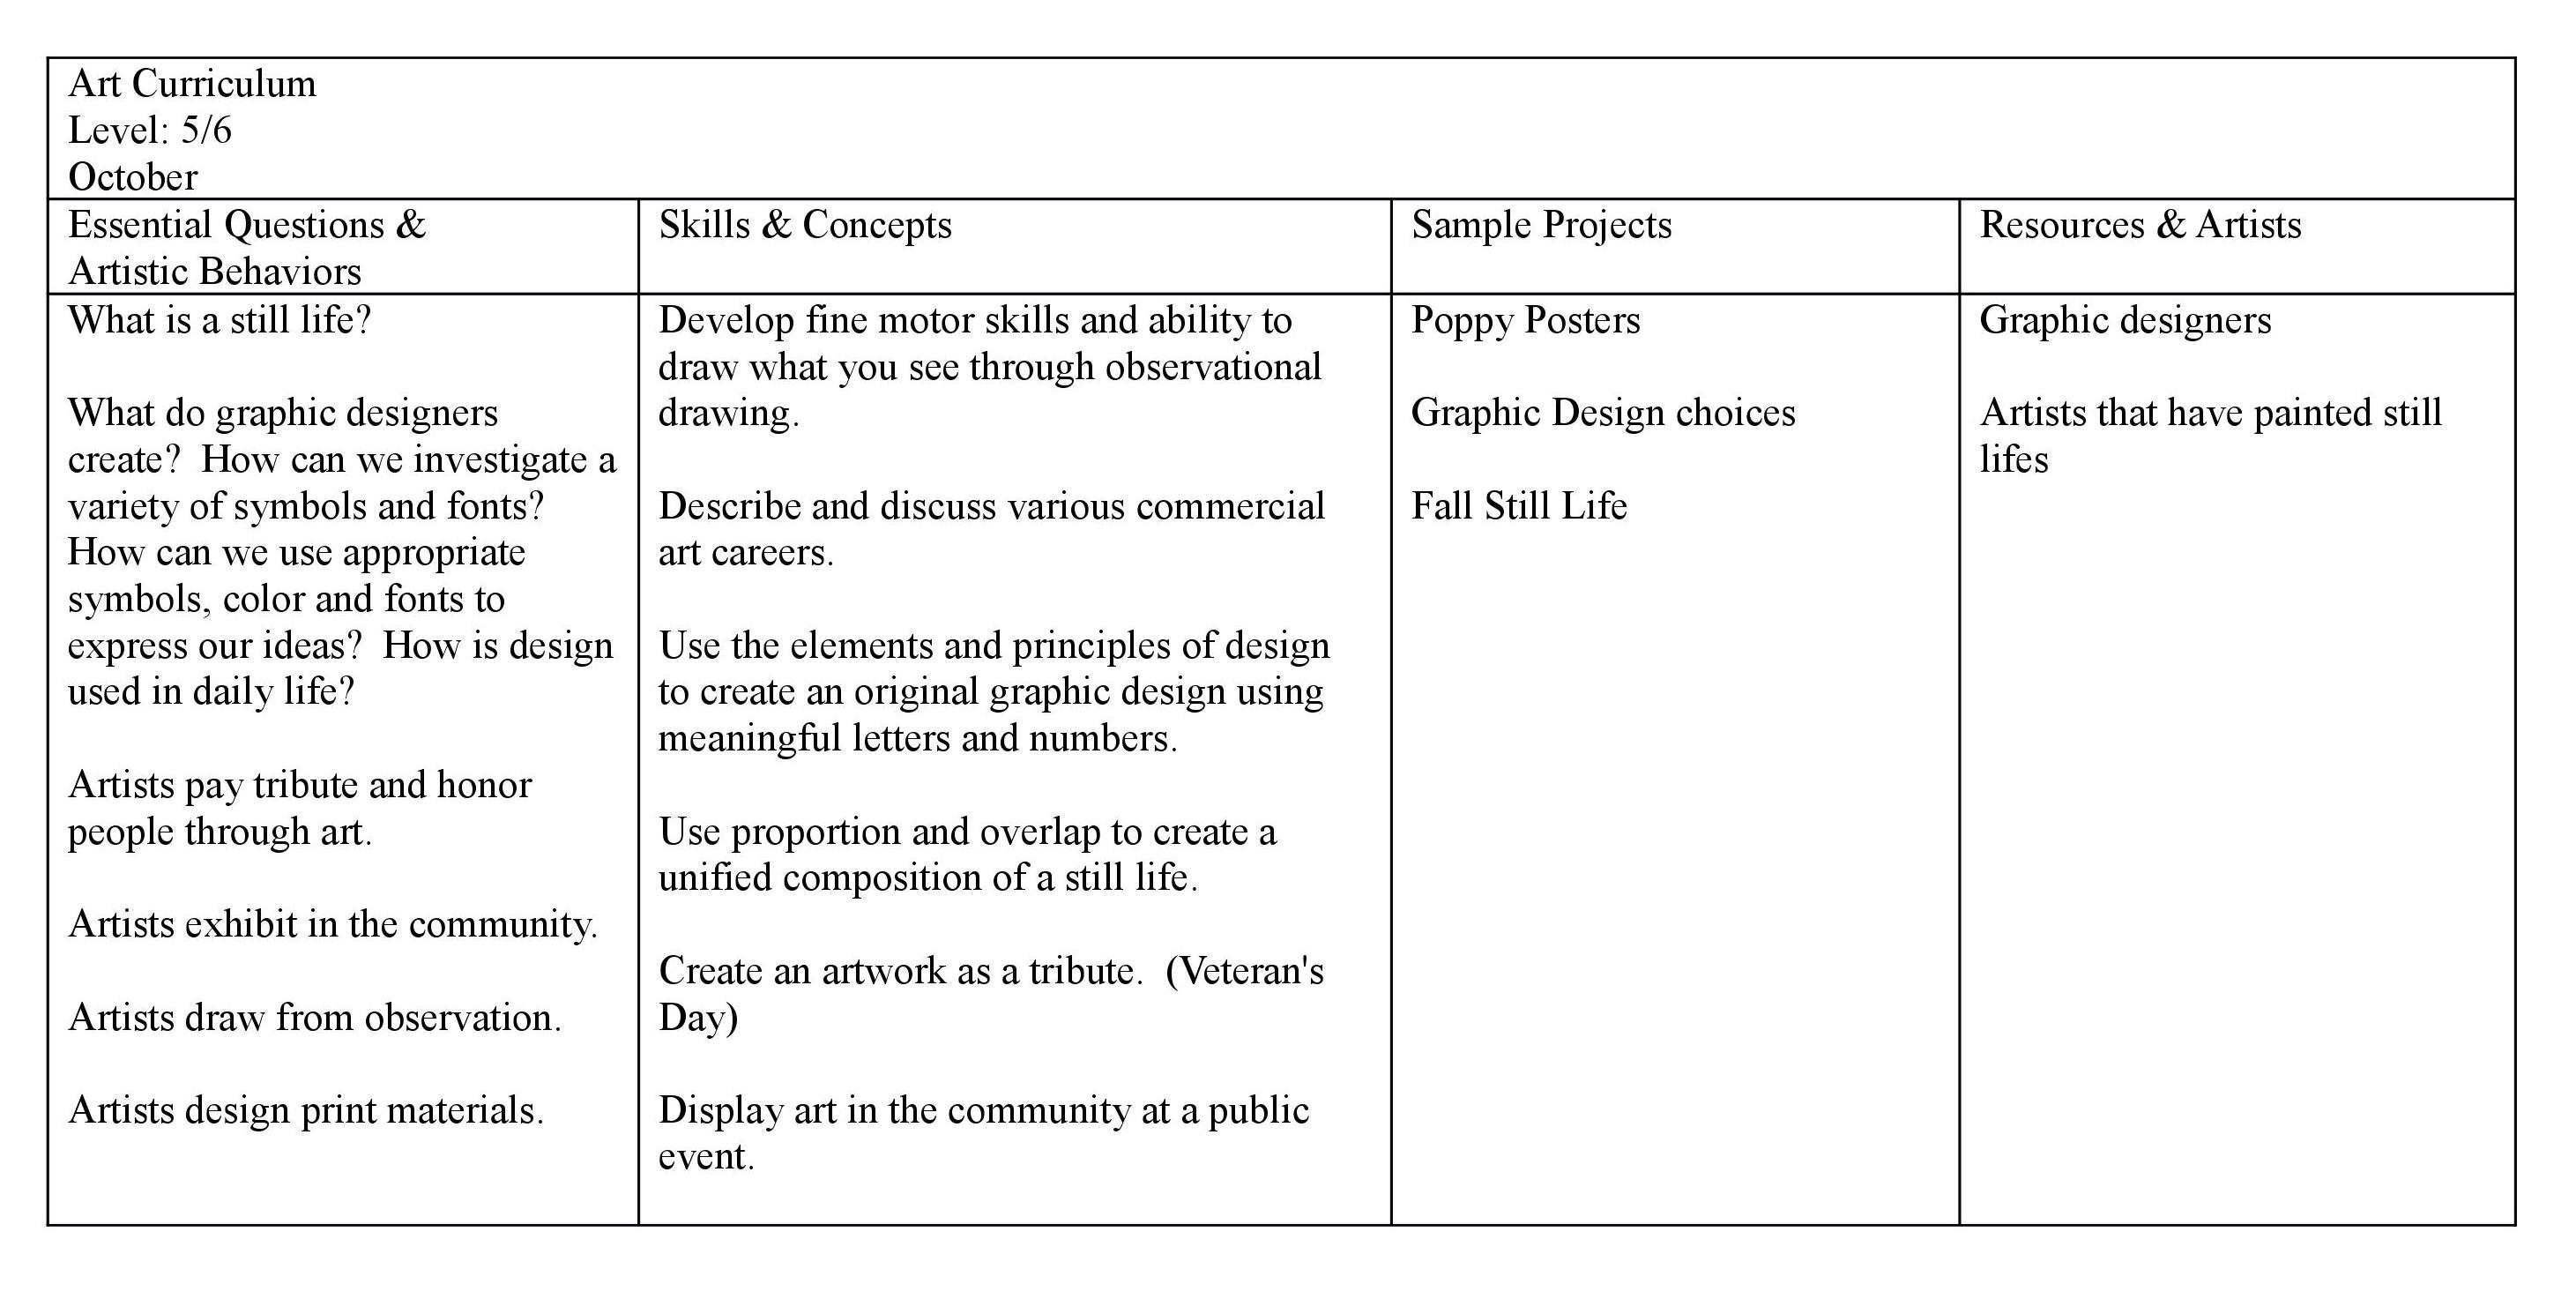 curriculum guide template - Ataum berglauf-verband com